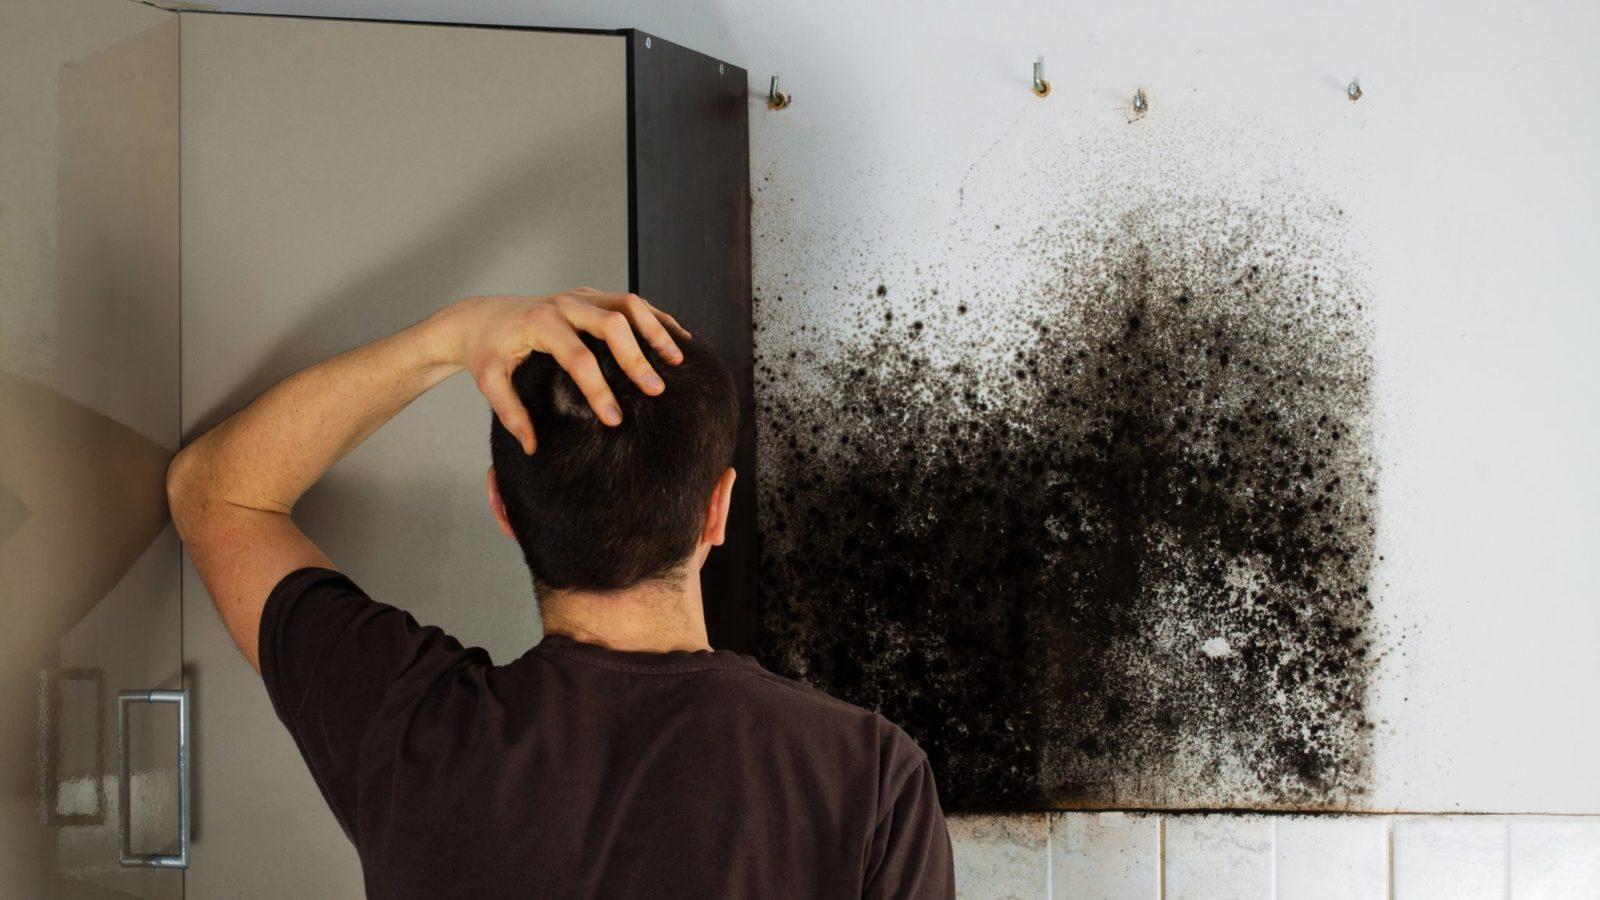 breathe easy, black mold